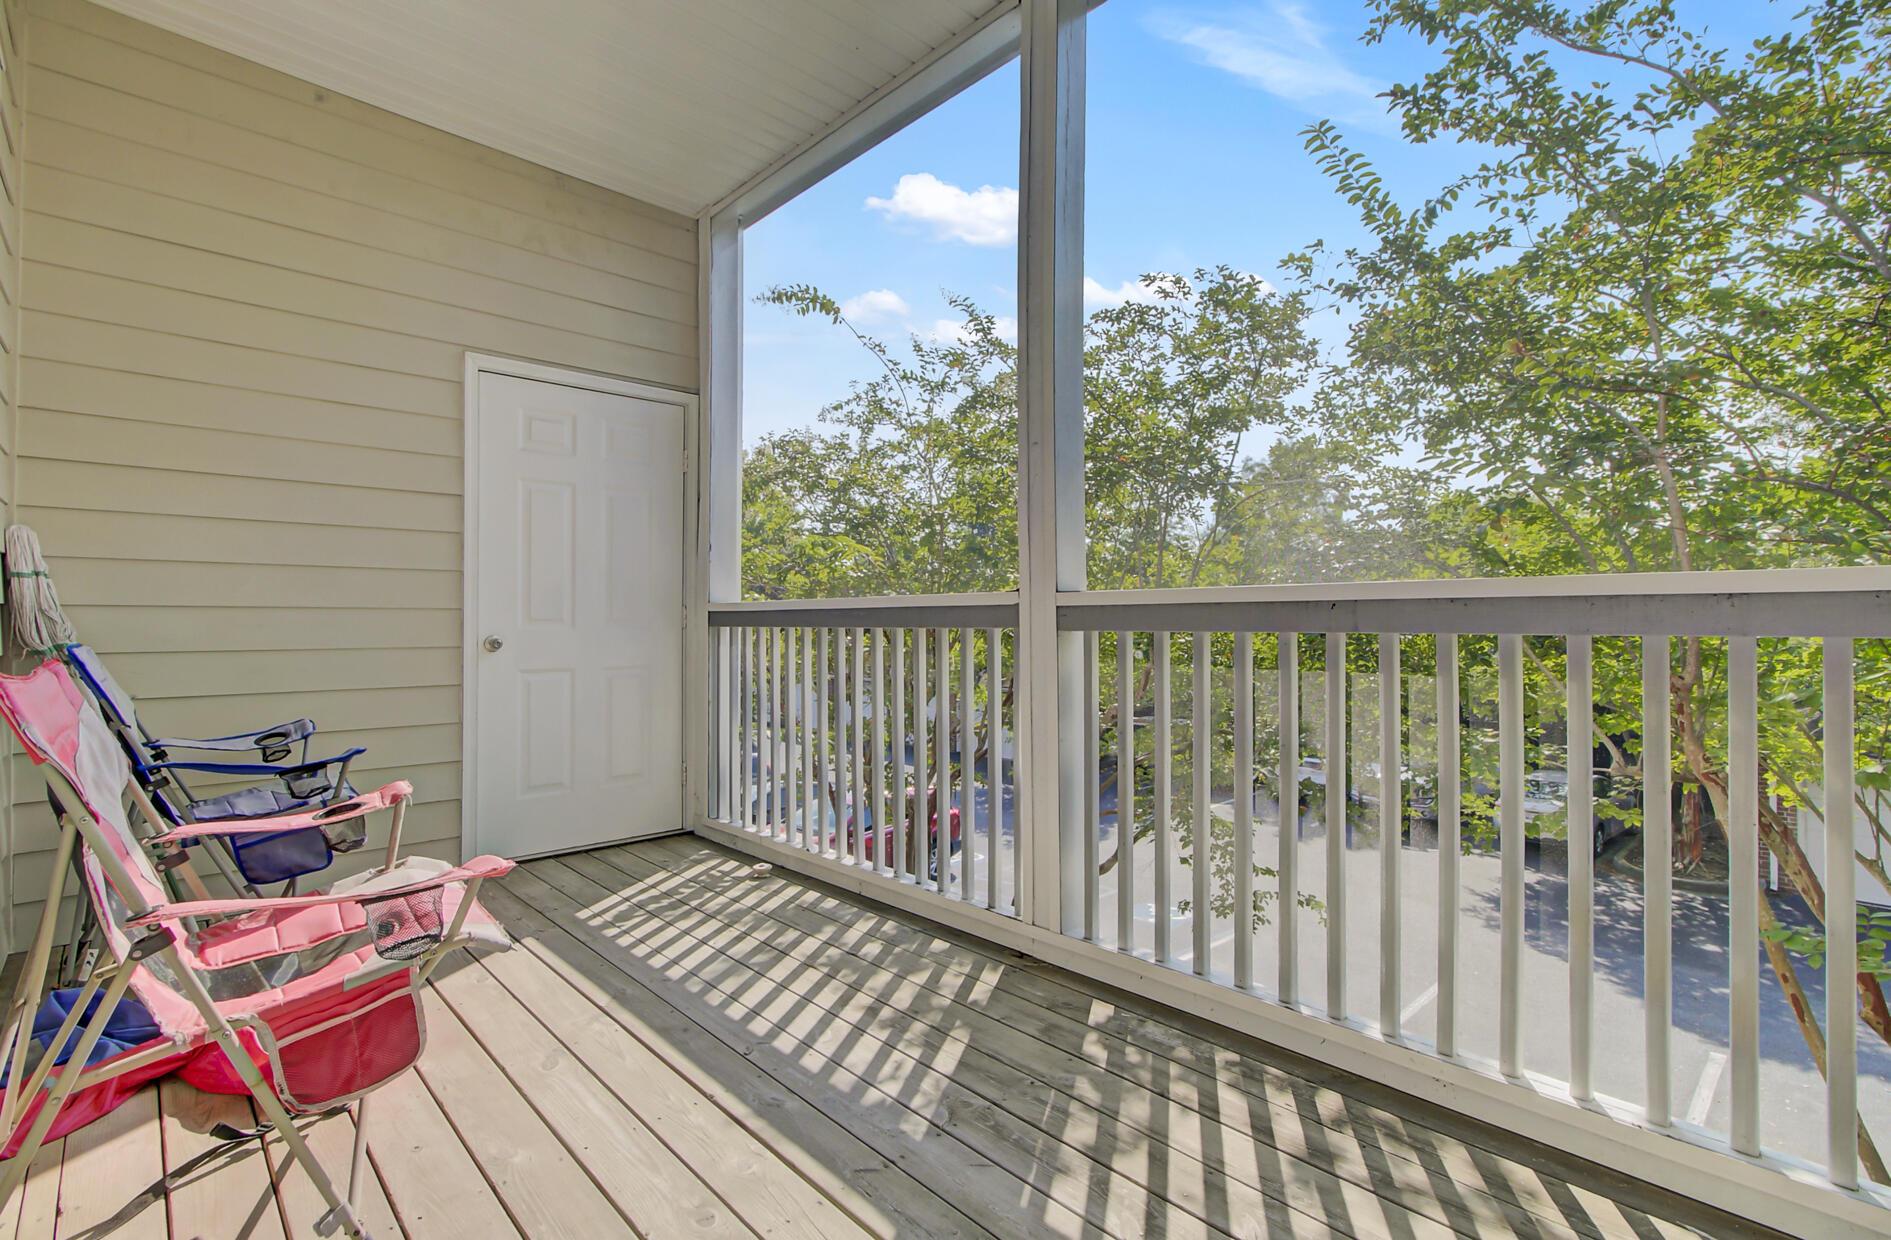 Cambridge Lakes Homes For Sale - 1485 Cambridge Lakes, Mount Pleasant, SC - 23